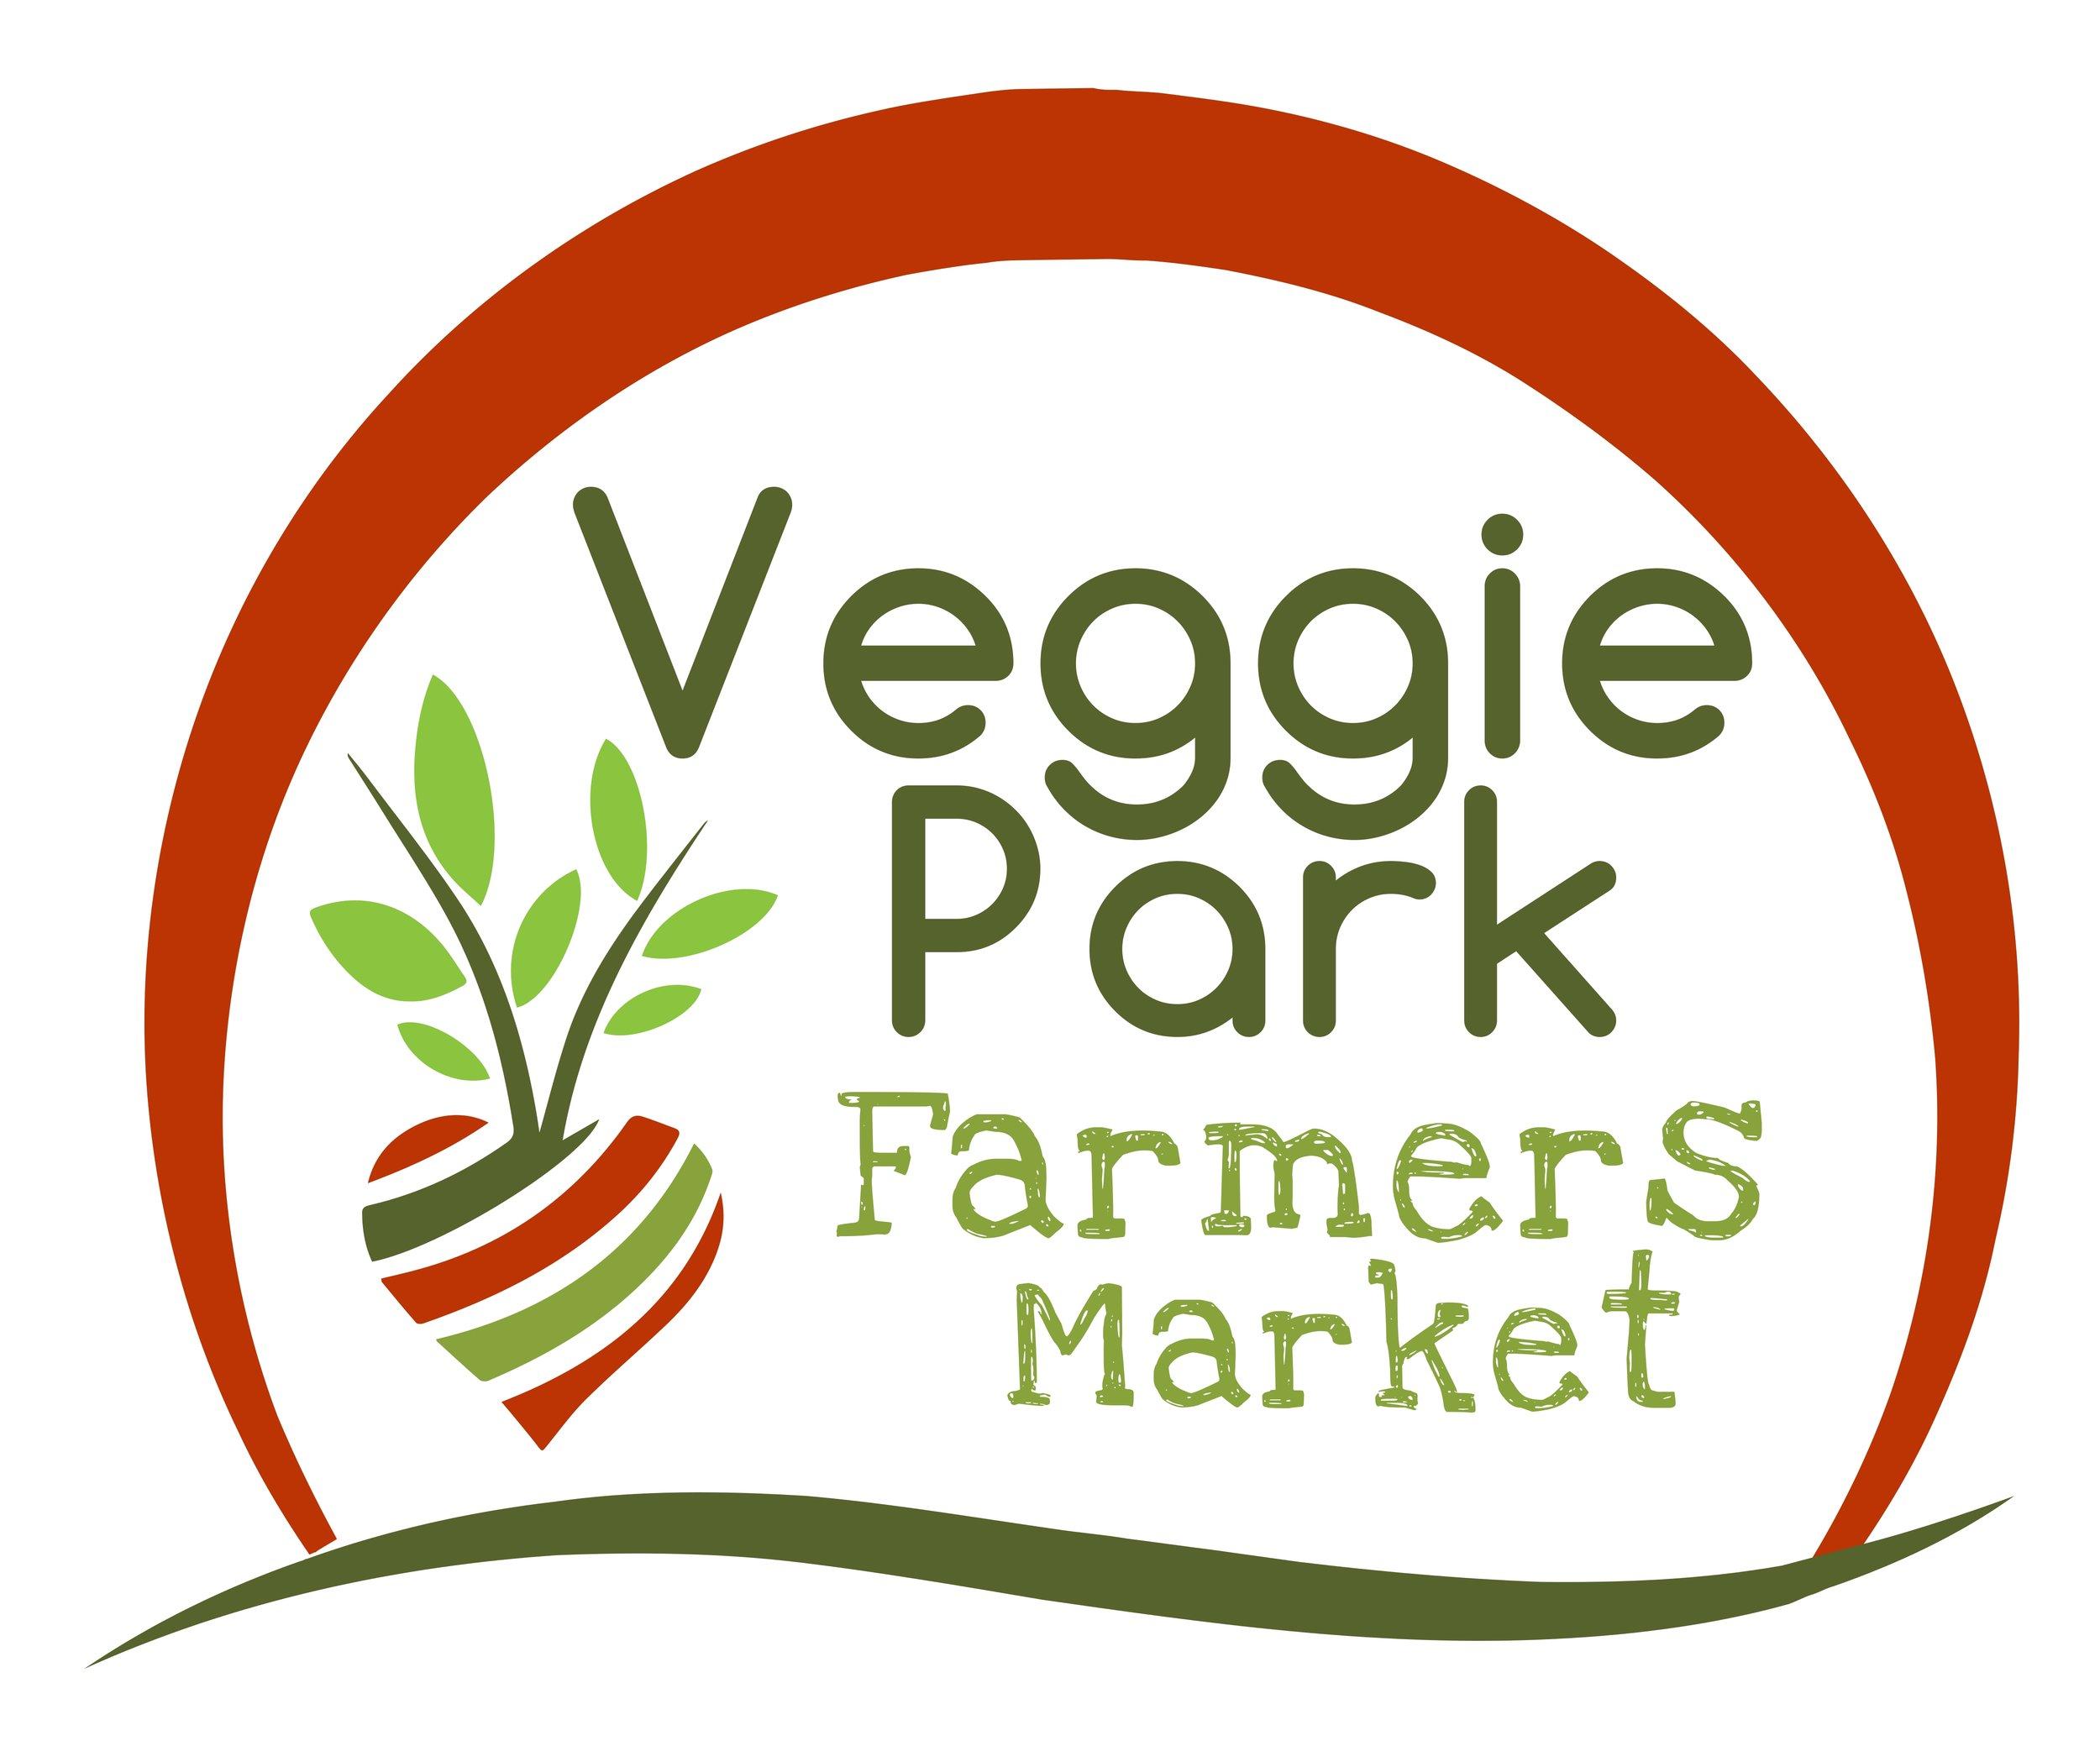 Veggie Park Farmers Market   Open on Tuesdays from 4:30pm-7pm  Market runs April-October.  109 Eve Street, Augusta, GA 30904  Contact: Kim Hines  kim@augustalocallygrown.org